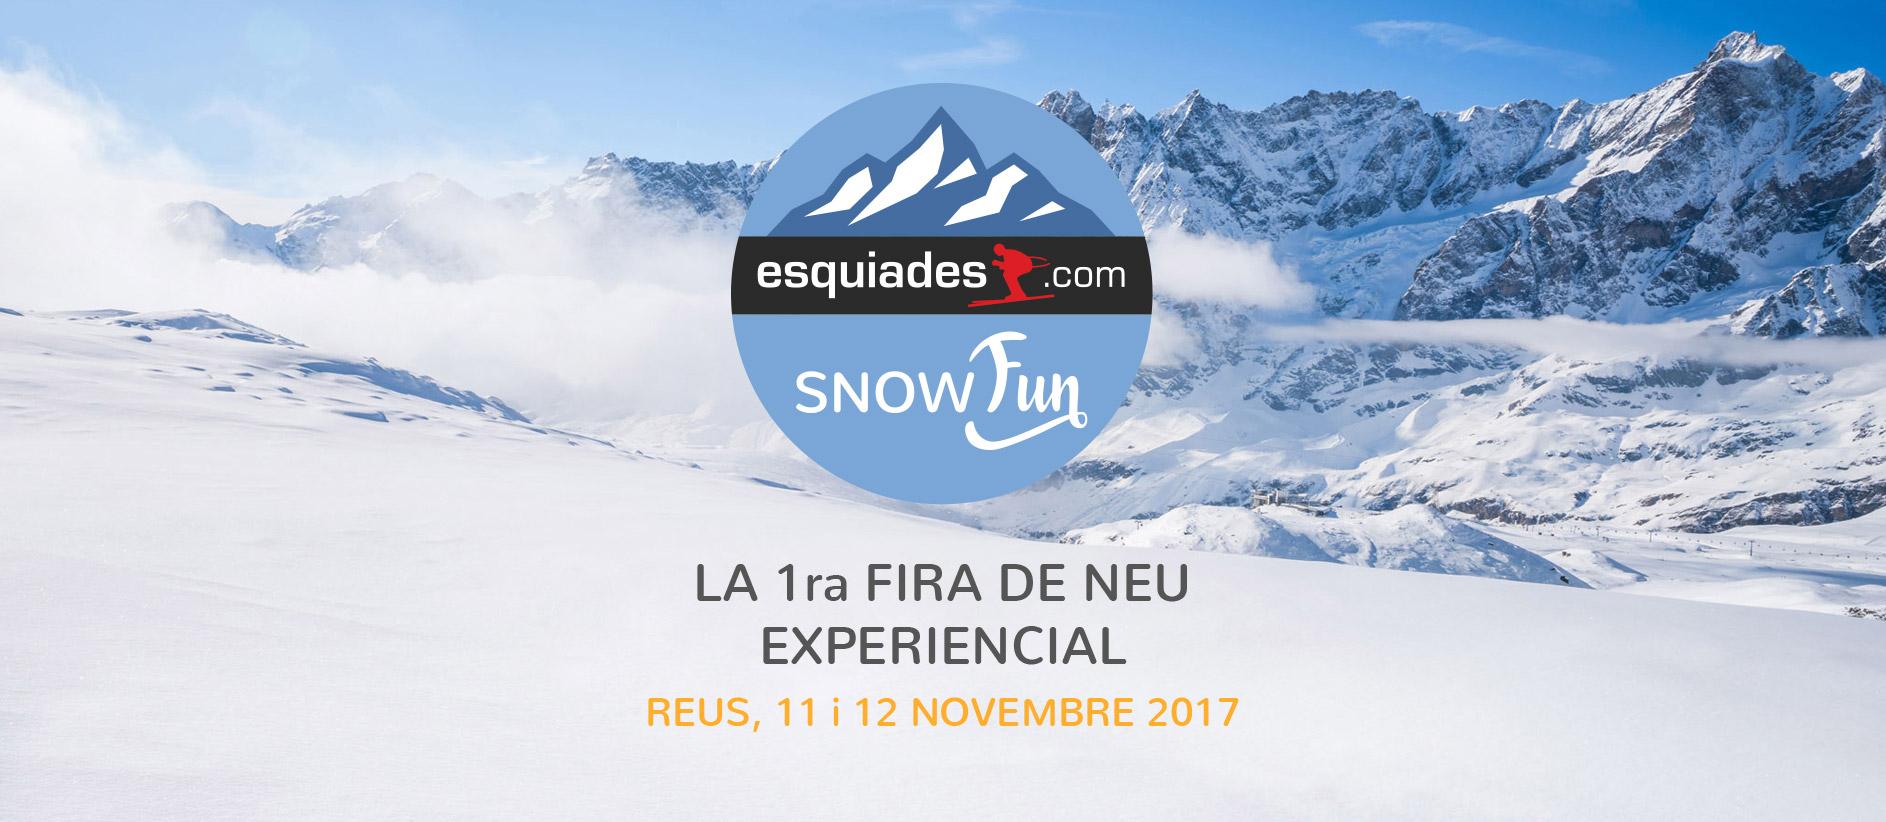 esquiades-snowfun-PORTADA-NOTICIA-cat